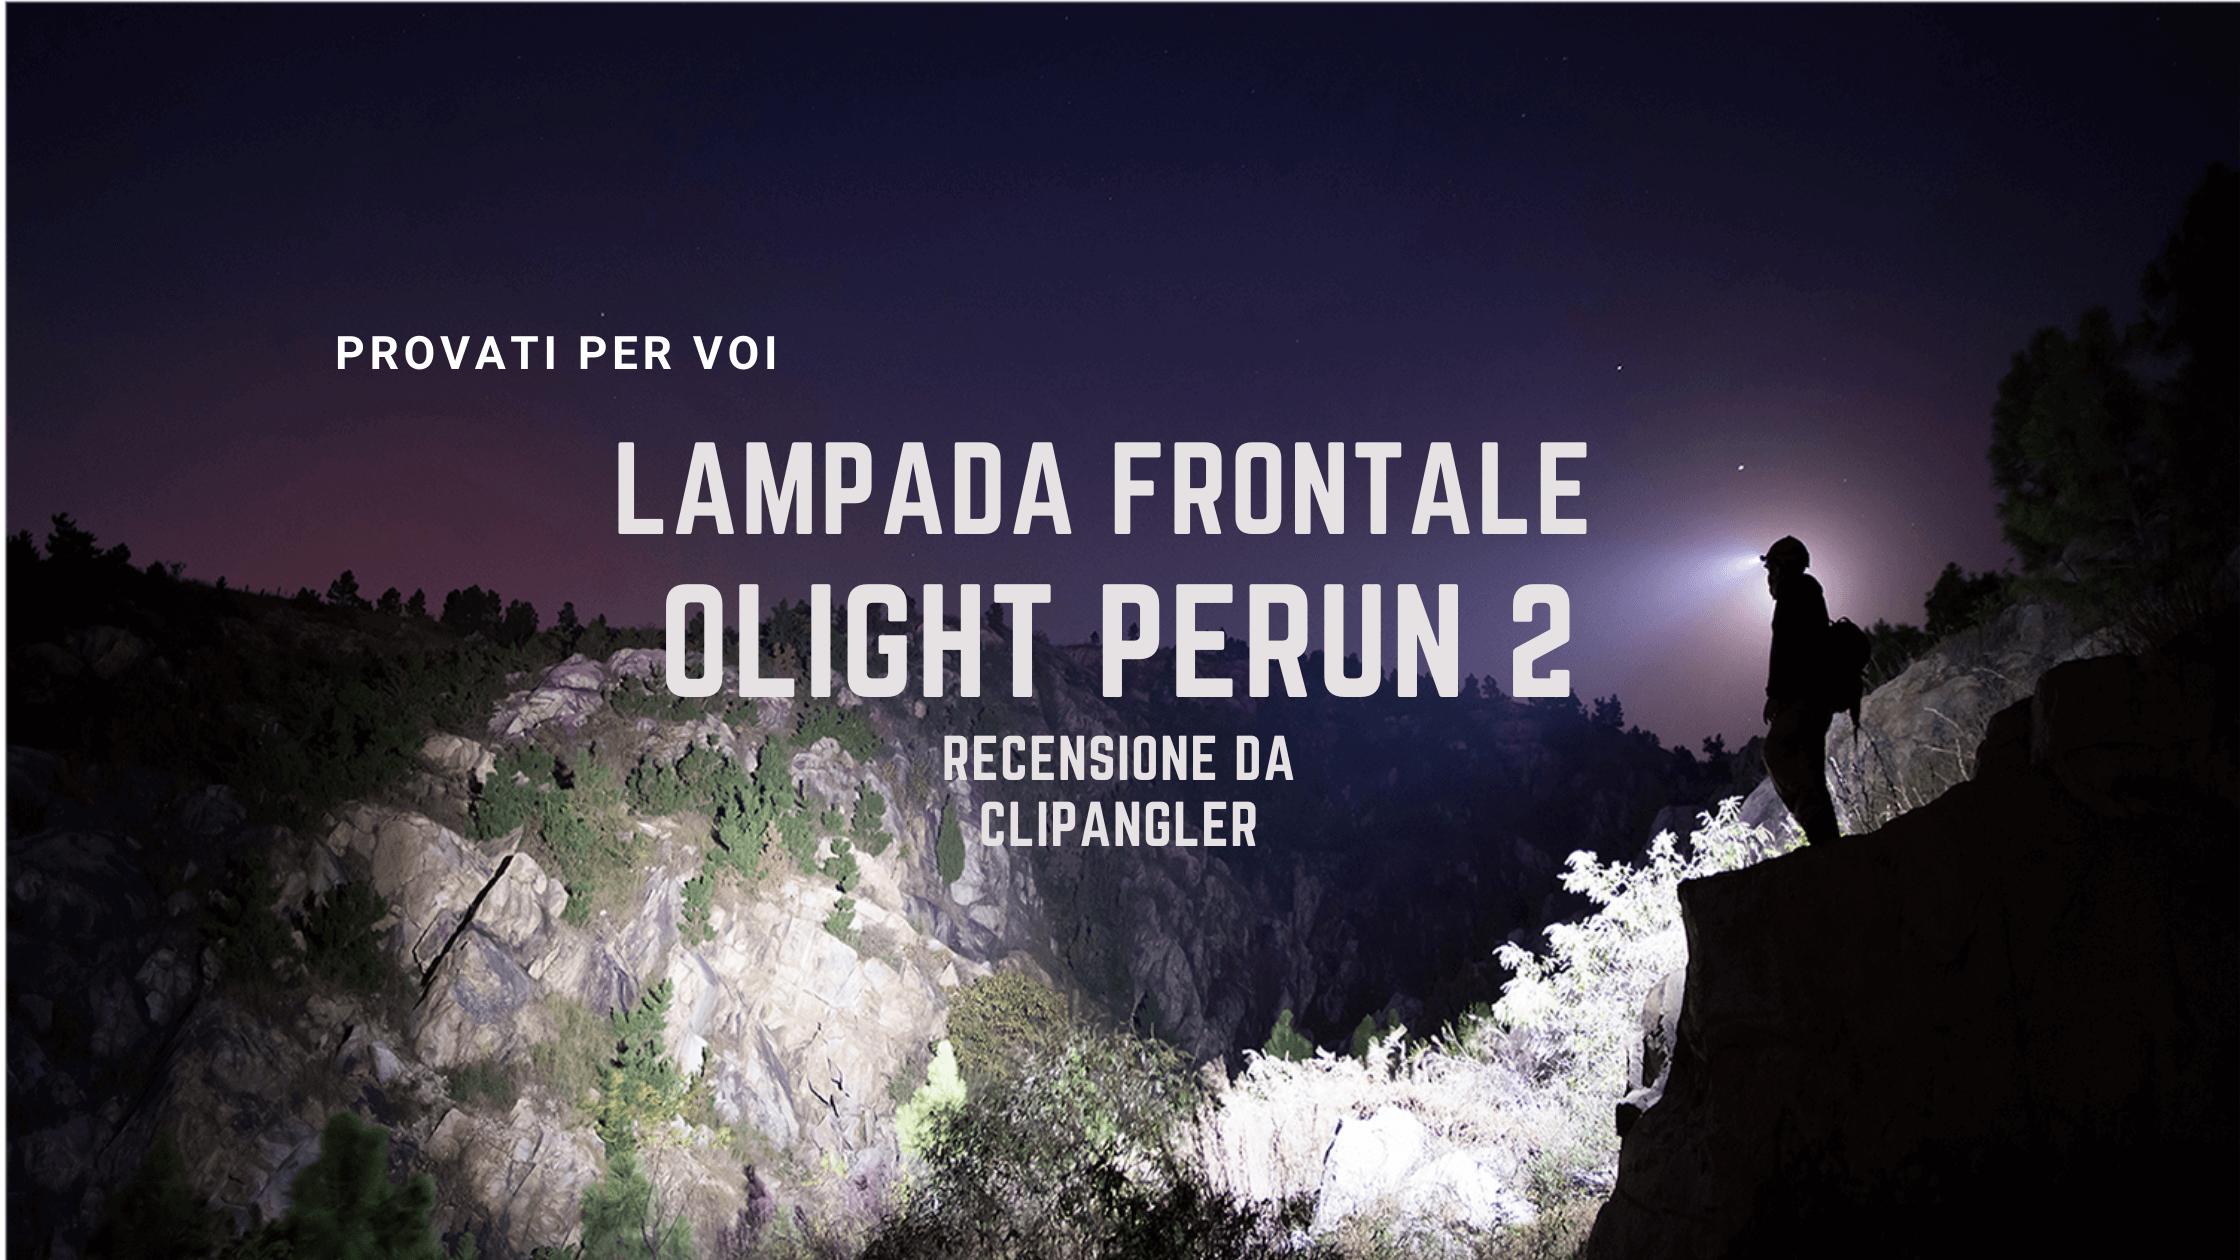 Lampada frontale OLIGHT PERUN 2